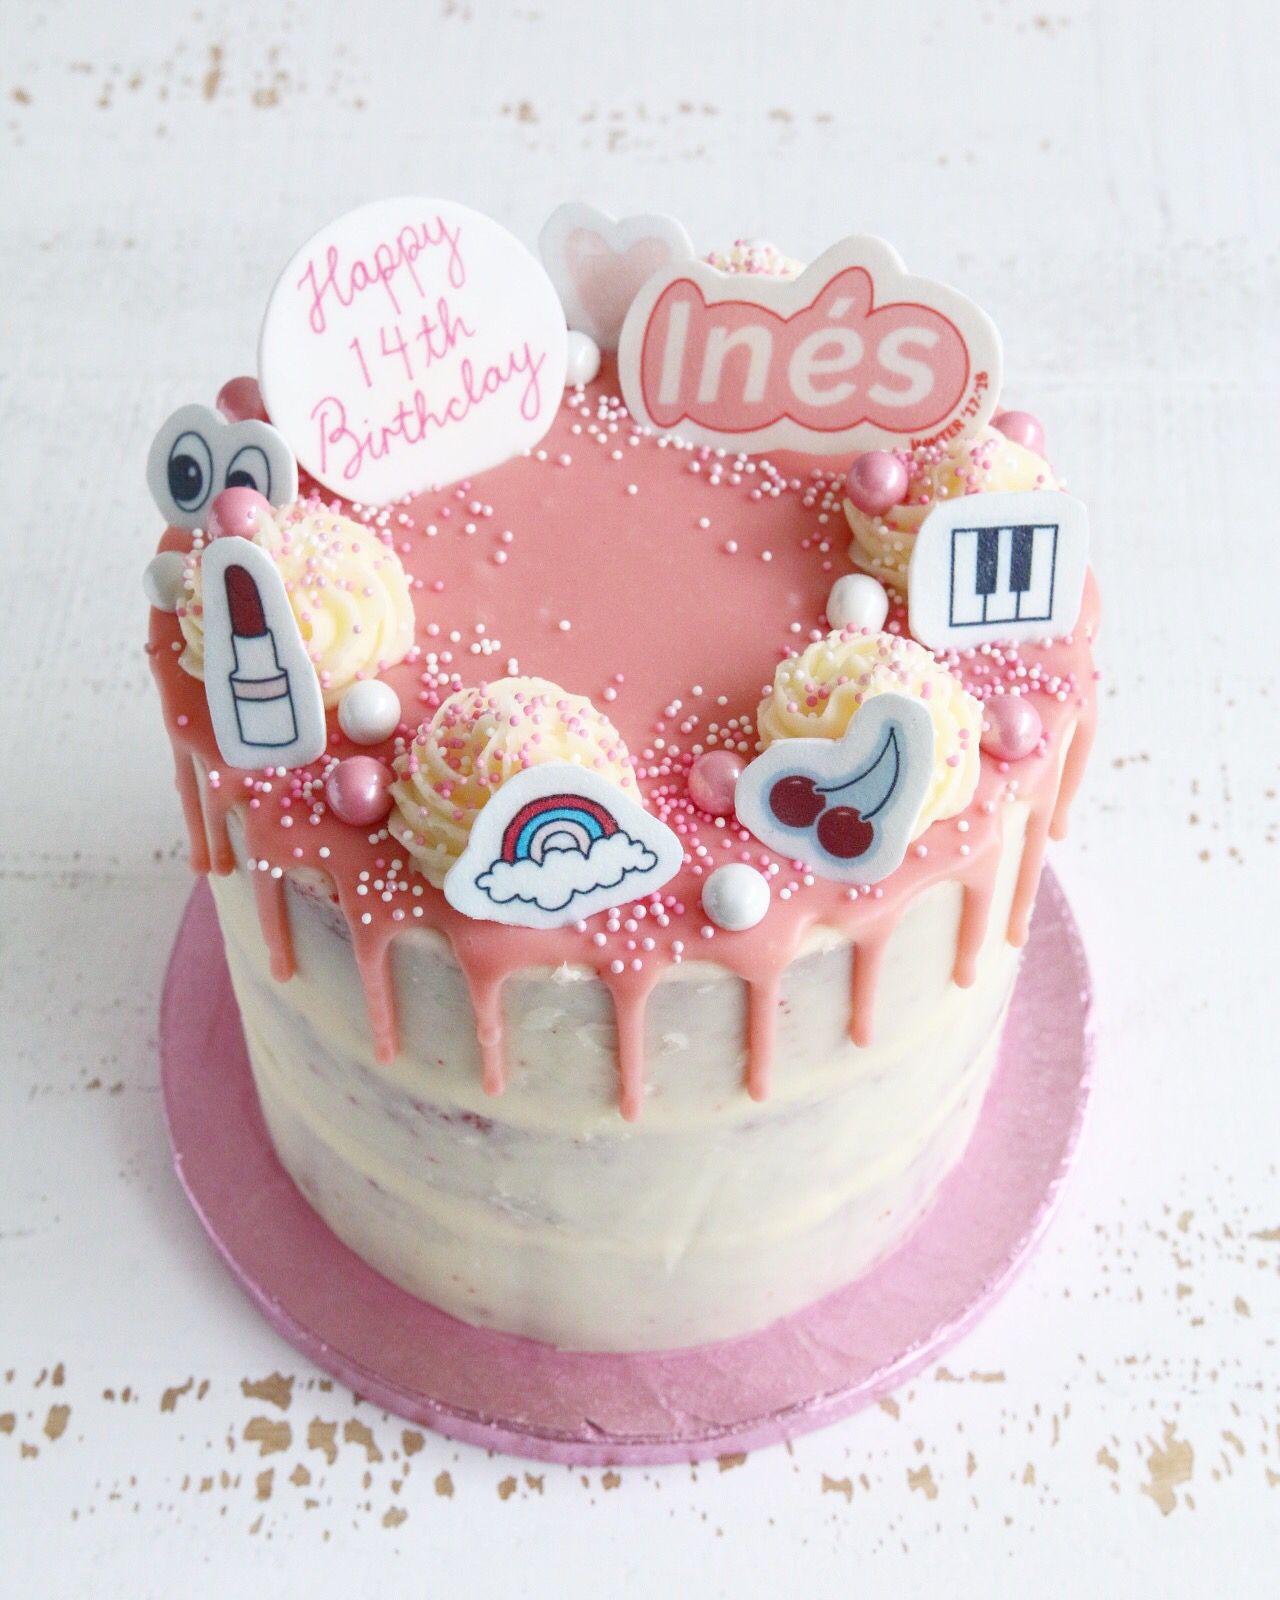 Glossier Pink Cake